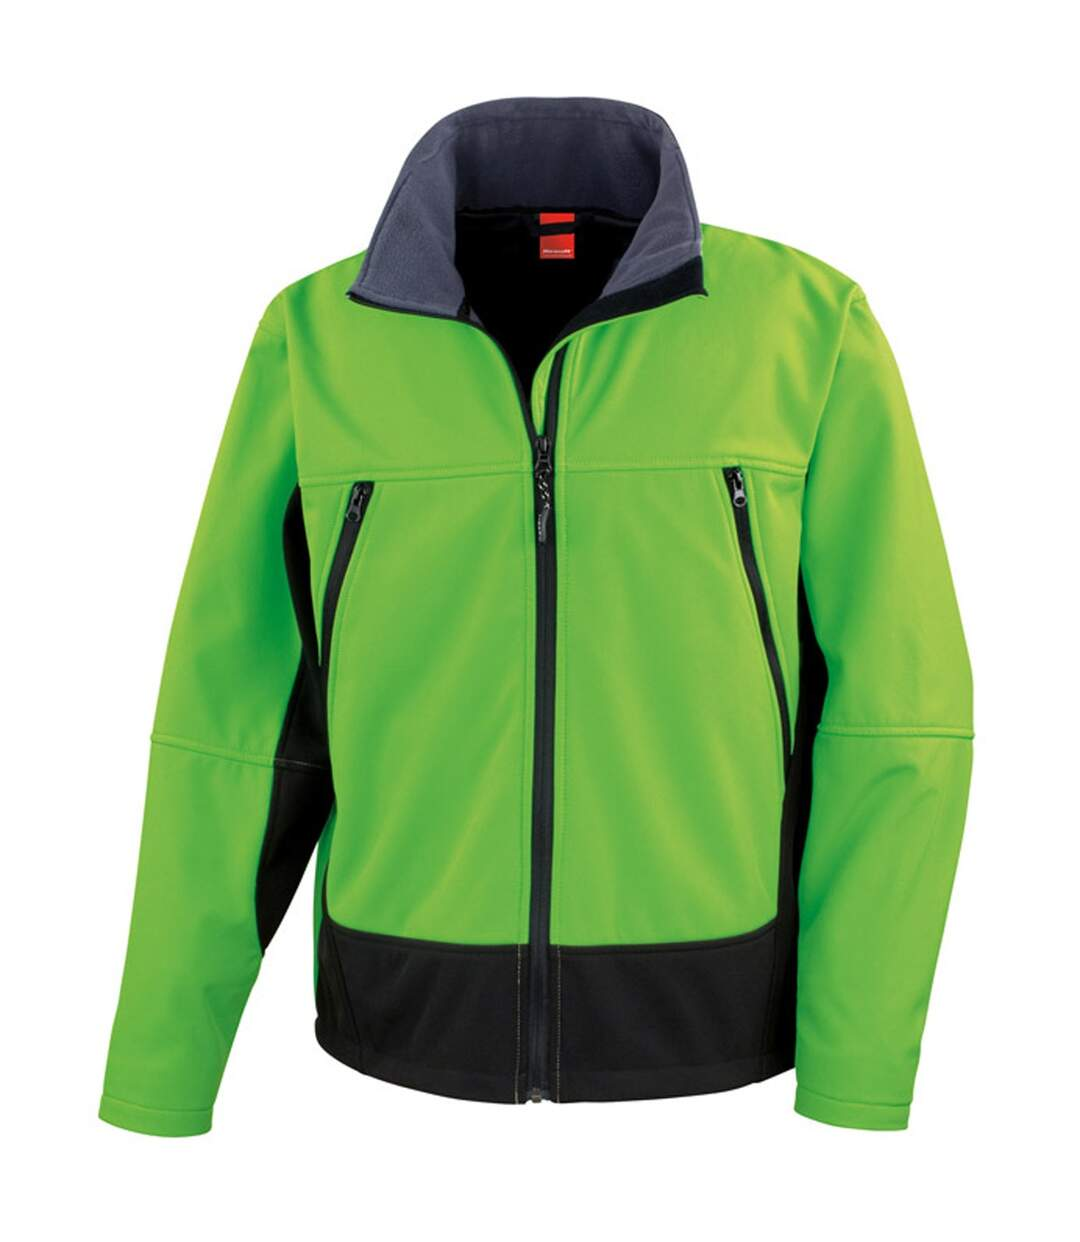 Veste softshell sport unisexe - R120X - vert